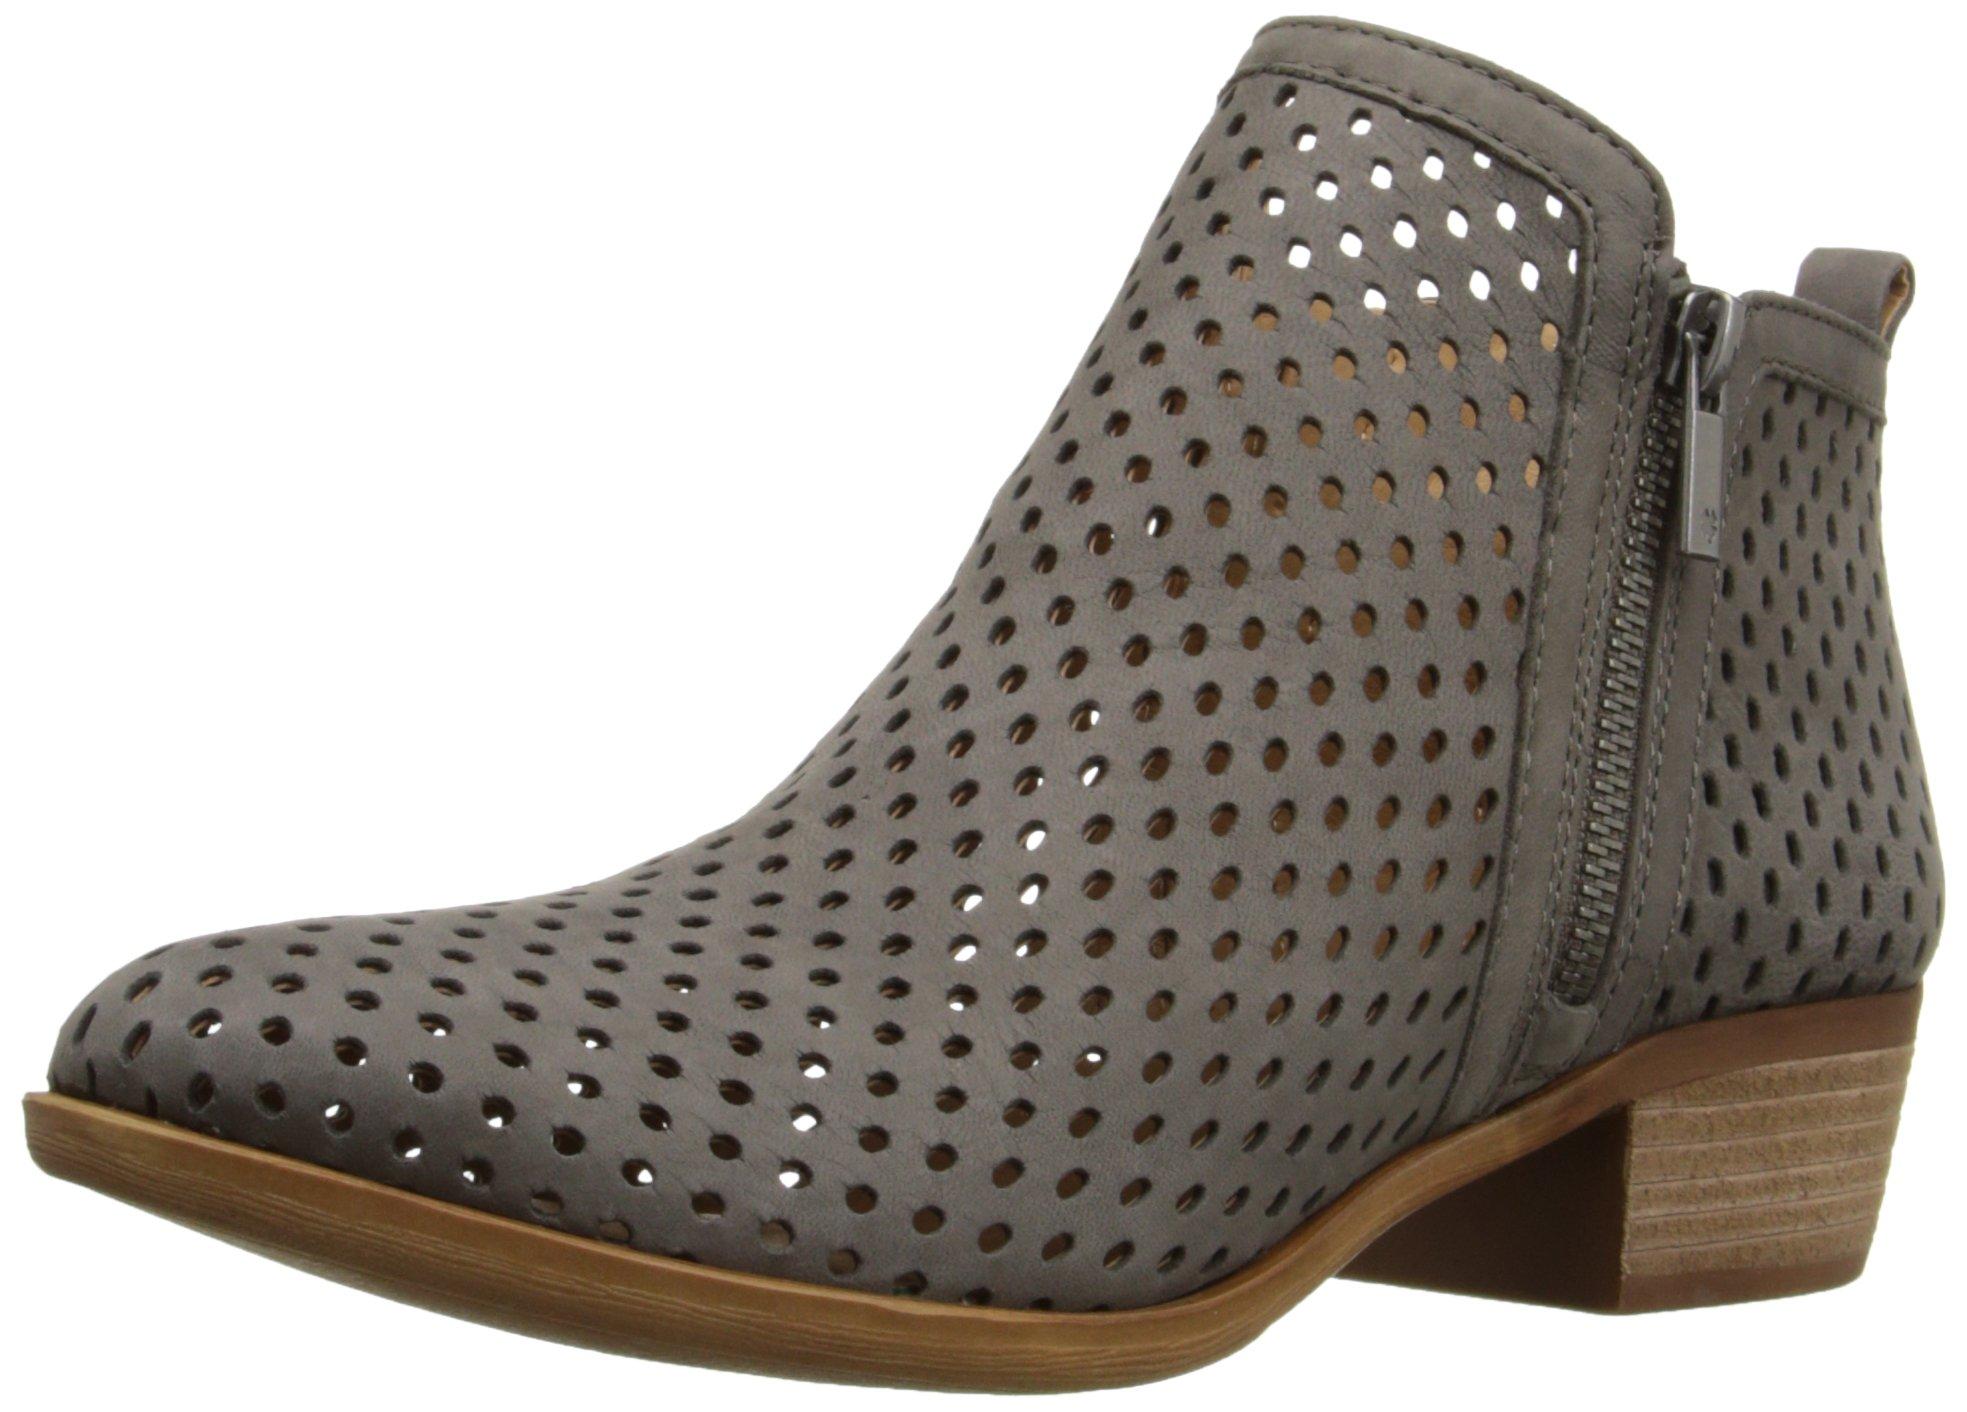 Lucky Brand Women's Basel3 Boot, Dark Stone, 9.5 M US by Lucky Brand